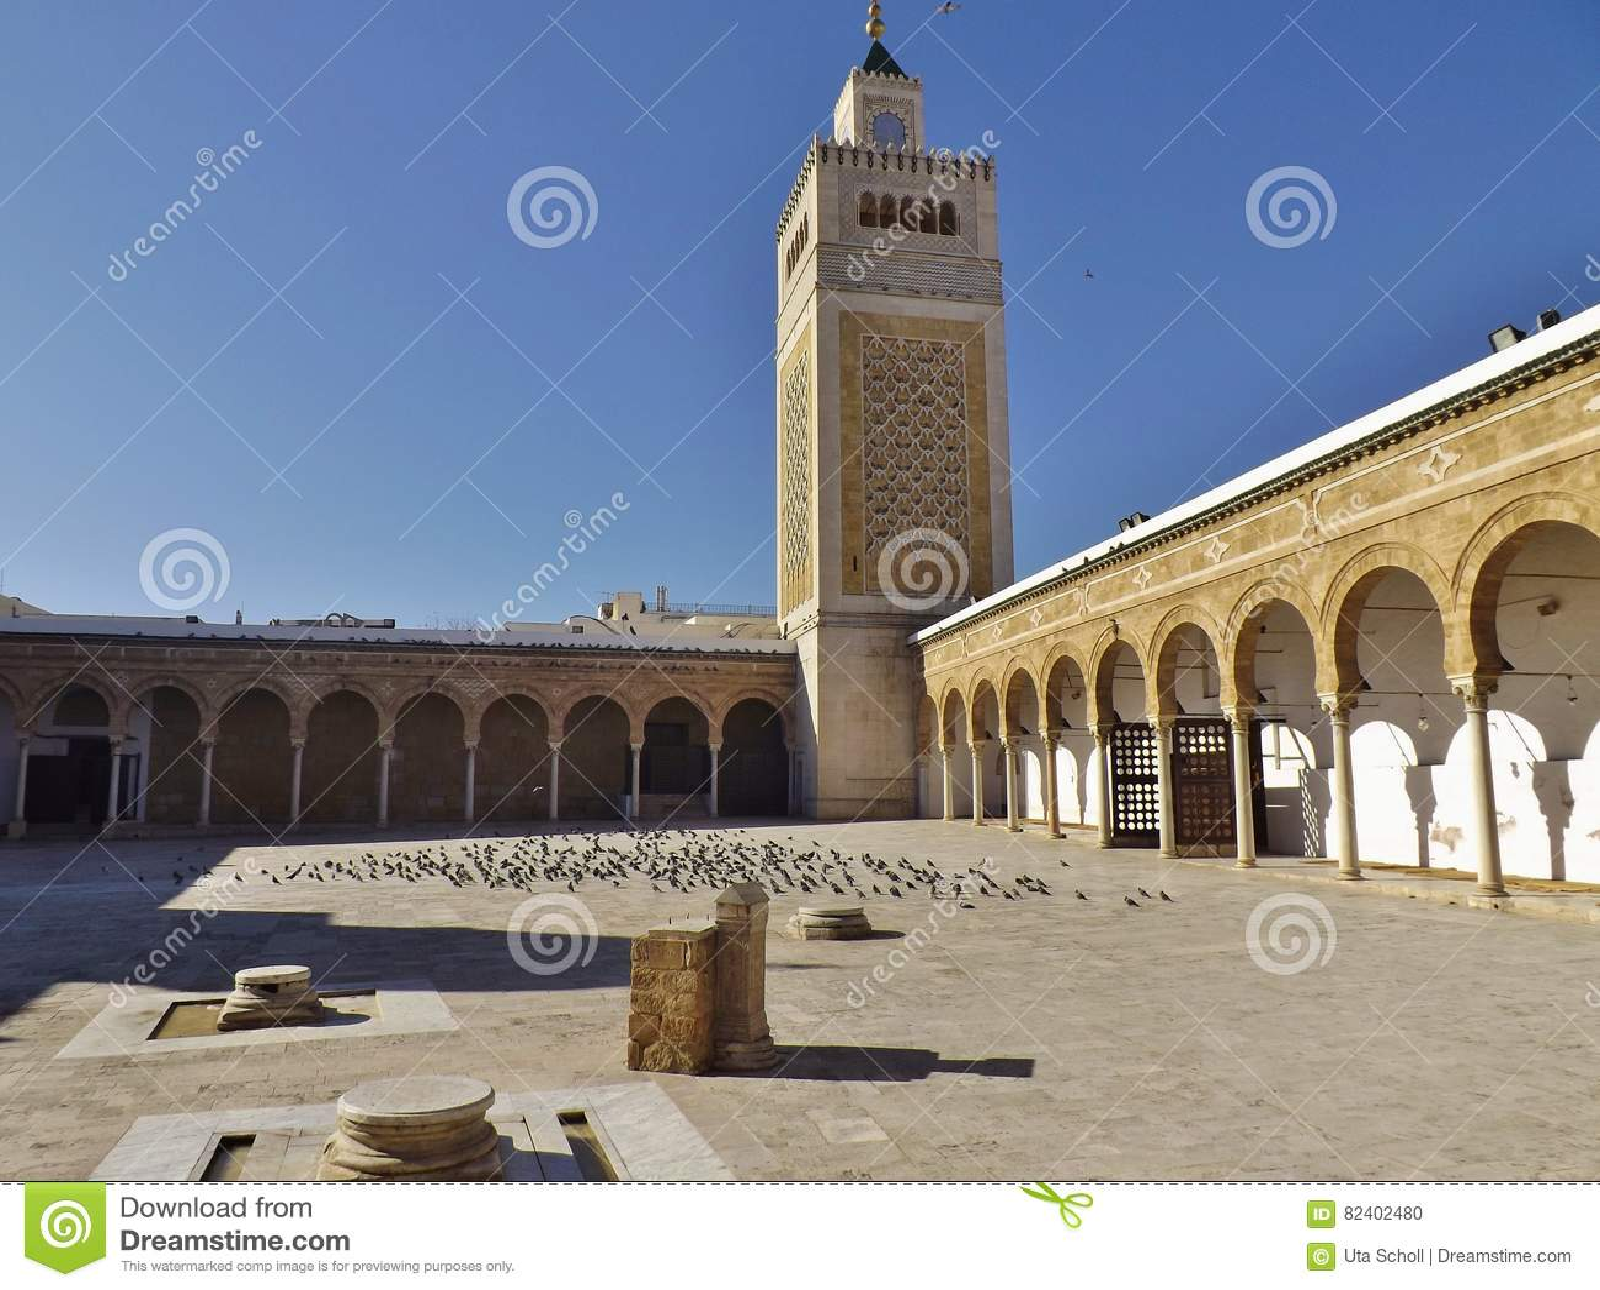 The Courtyard Of The Al Zaytuna Mosque In Tunis Tunisia Stock Photo Image Of Tunisia Tunisa 82402480